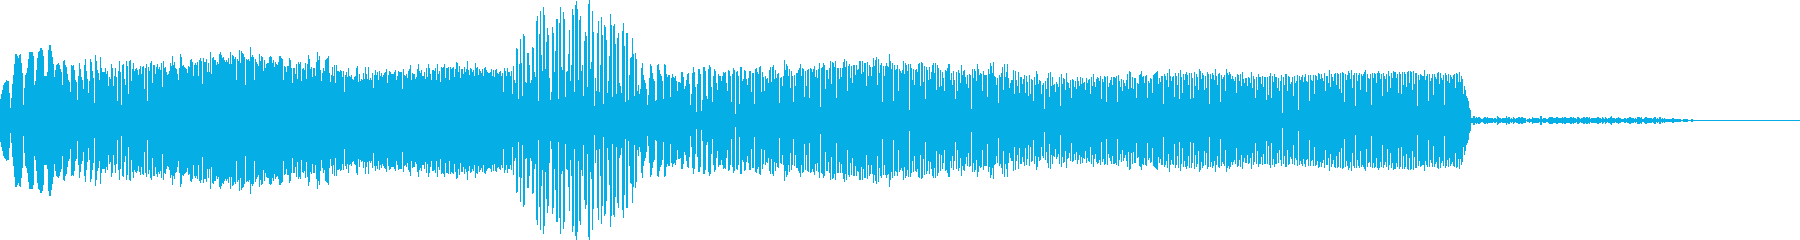 SF風 機械操作 選択音の再生済みの波形